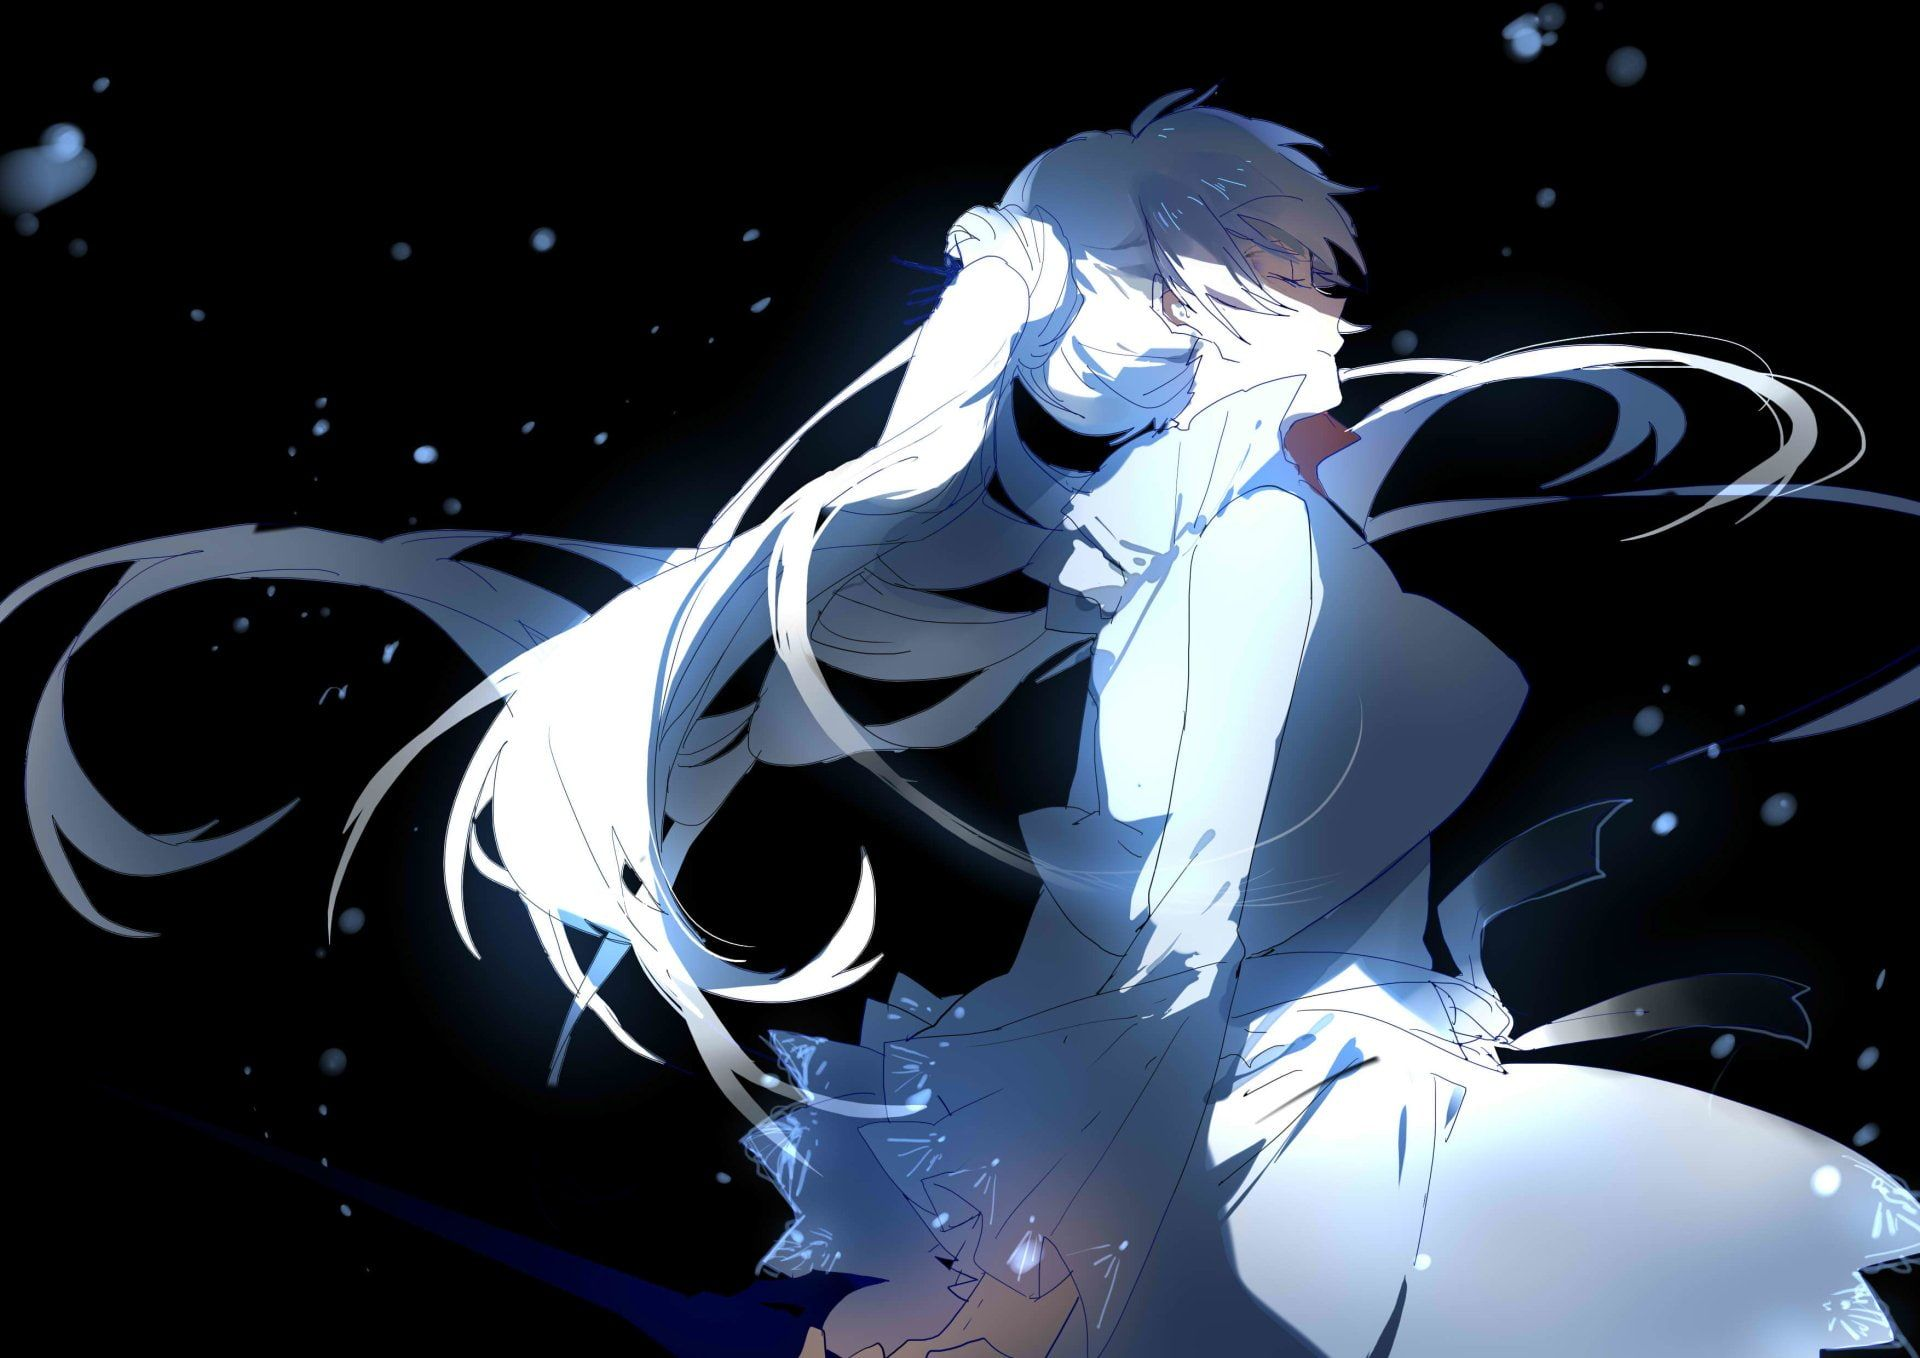 Anime Rwby Weiss Schnee 1080p Wallpaper Hdwallpaper Desktop Rwby Anime Rwby Rwby Weiss